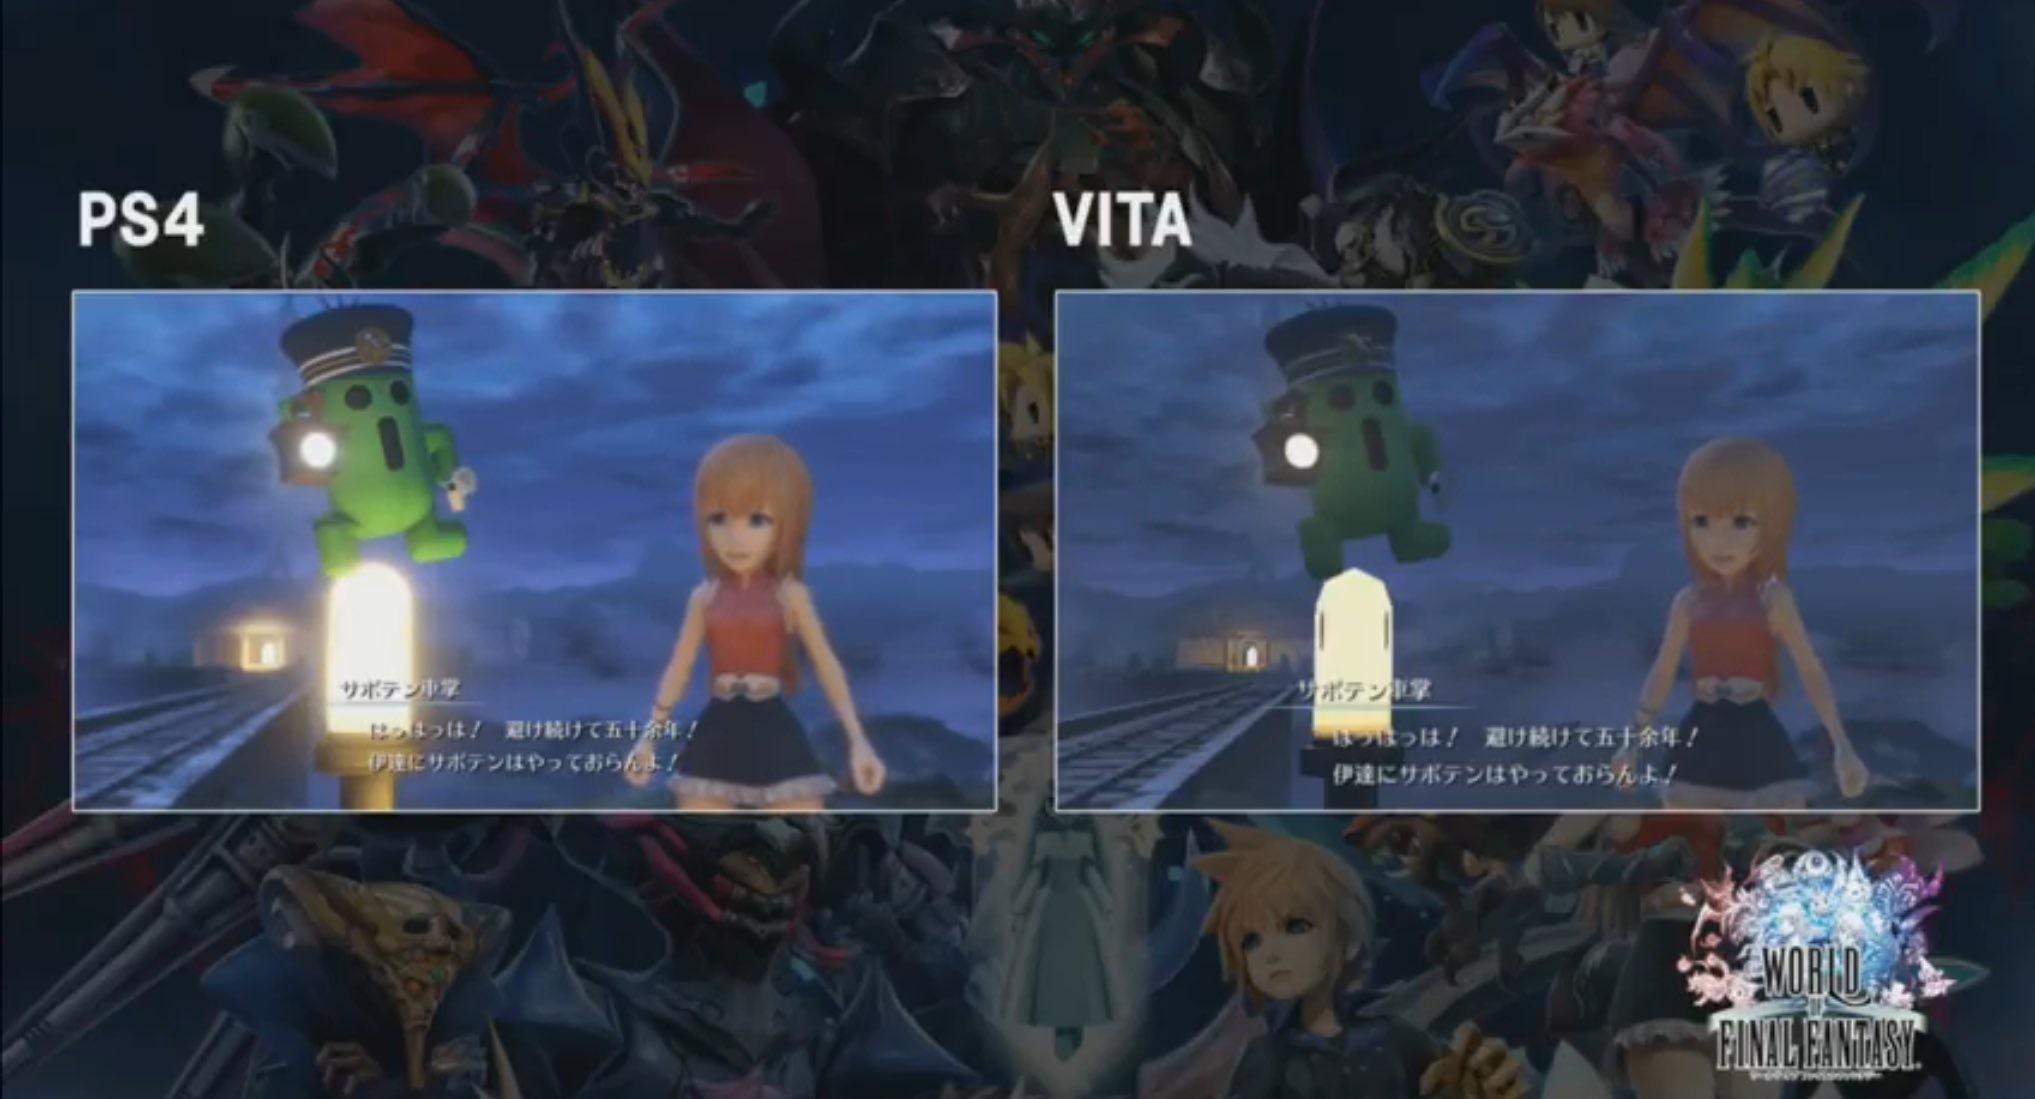 World of Final Fantasy: PS4 vs Vita and more - NeoGAF